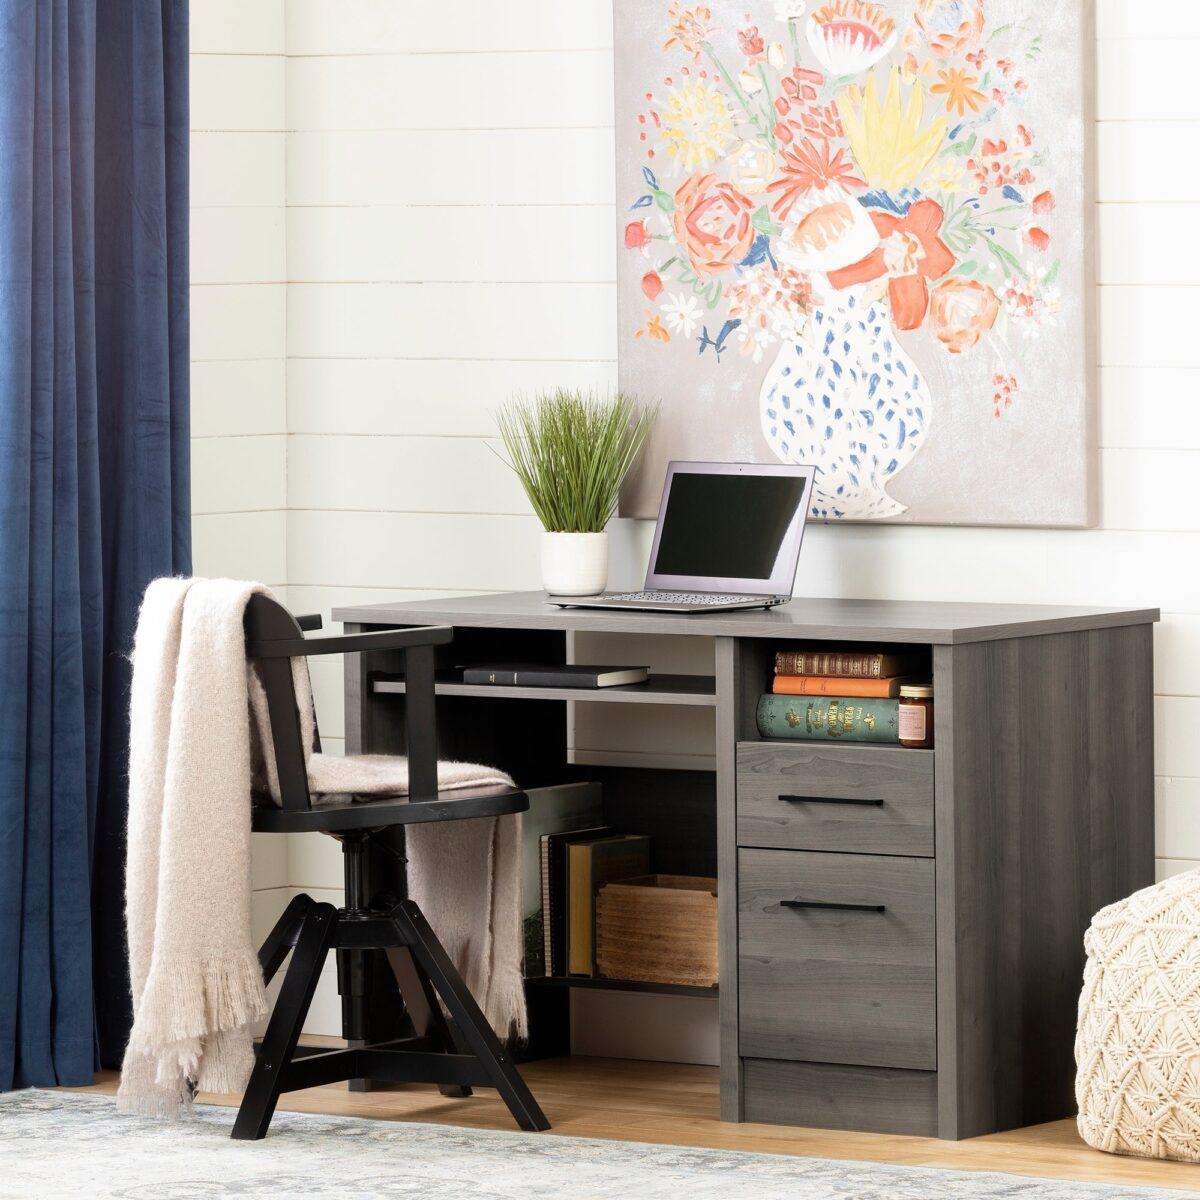 create-a-corner-study-in-the-bedroom-7